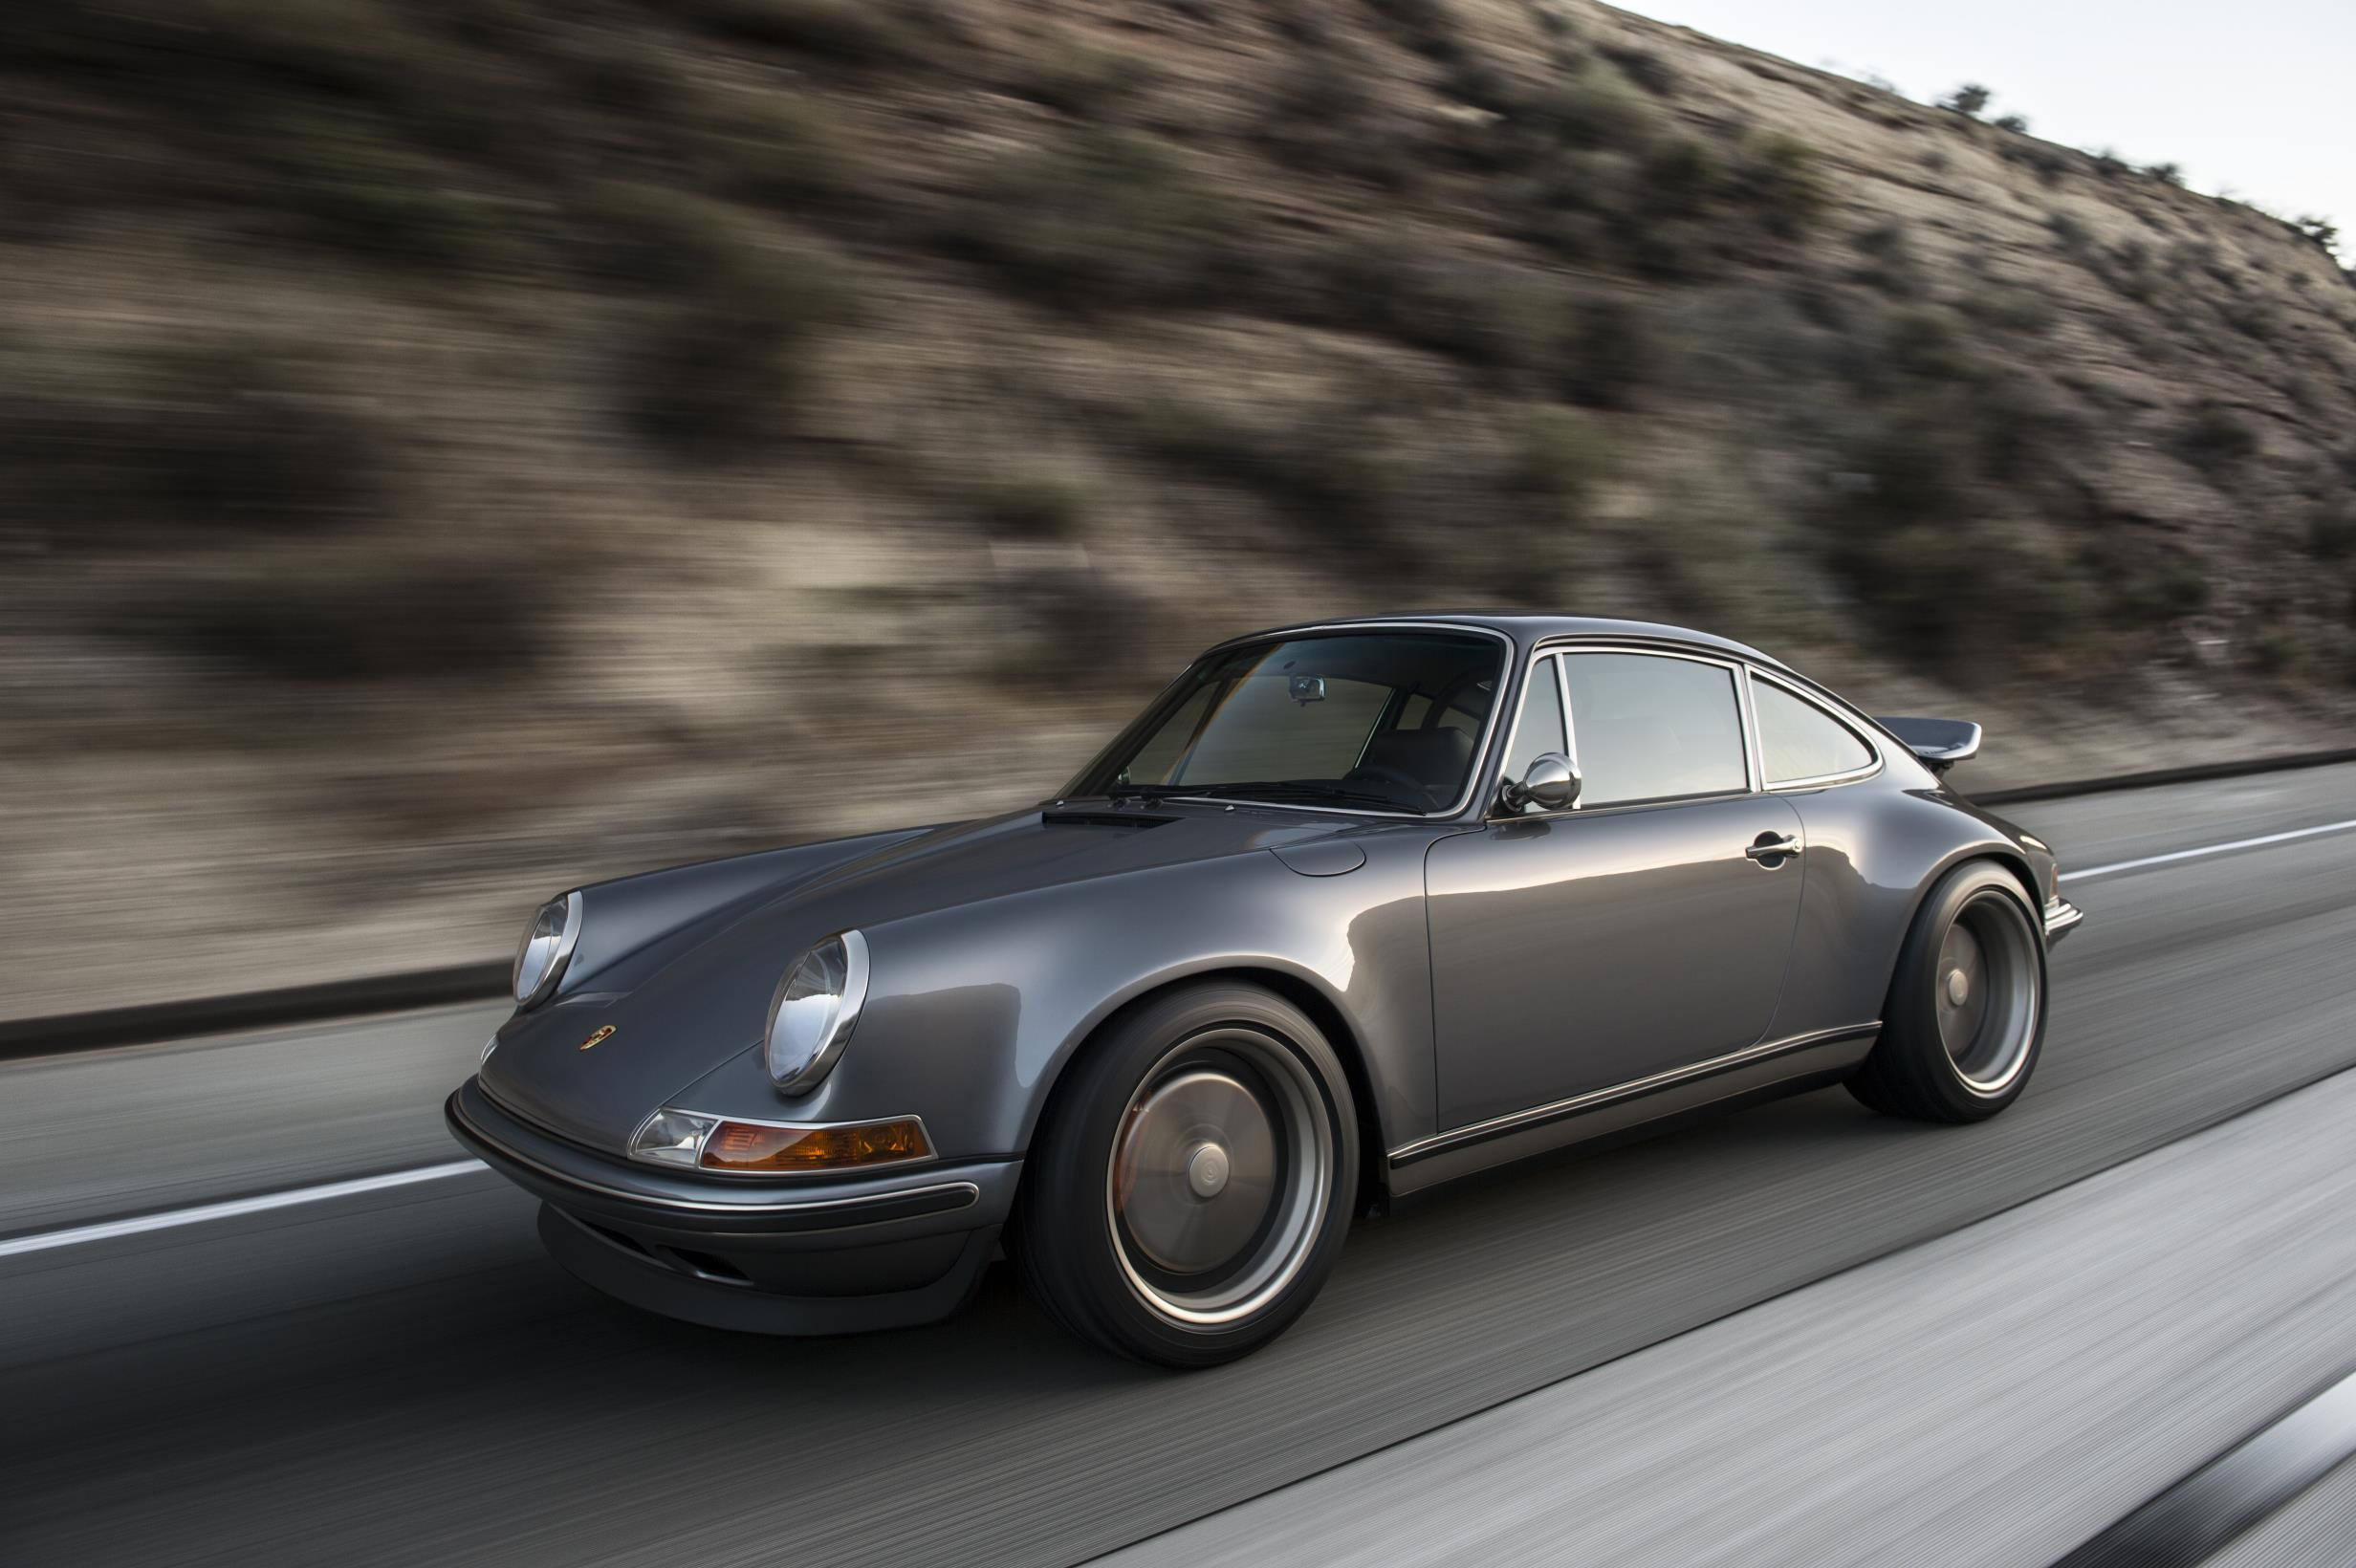 test drive grand new veloz 1.3 all innova venturer 2018 singer trots out its latest reimagined porsche 911s for pebble